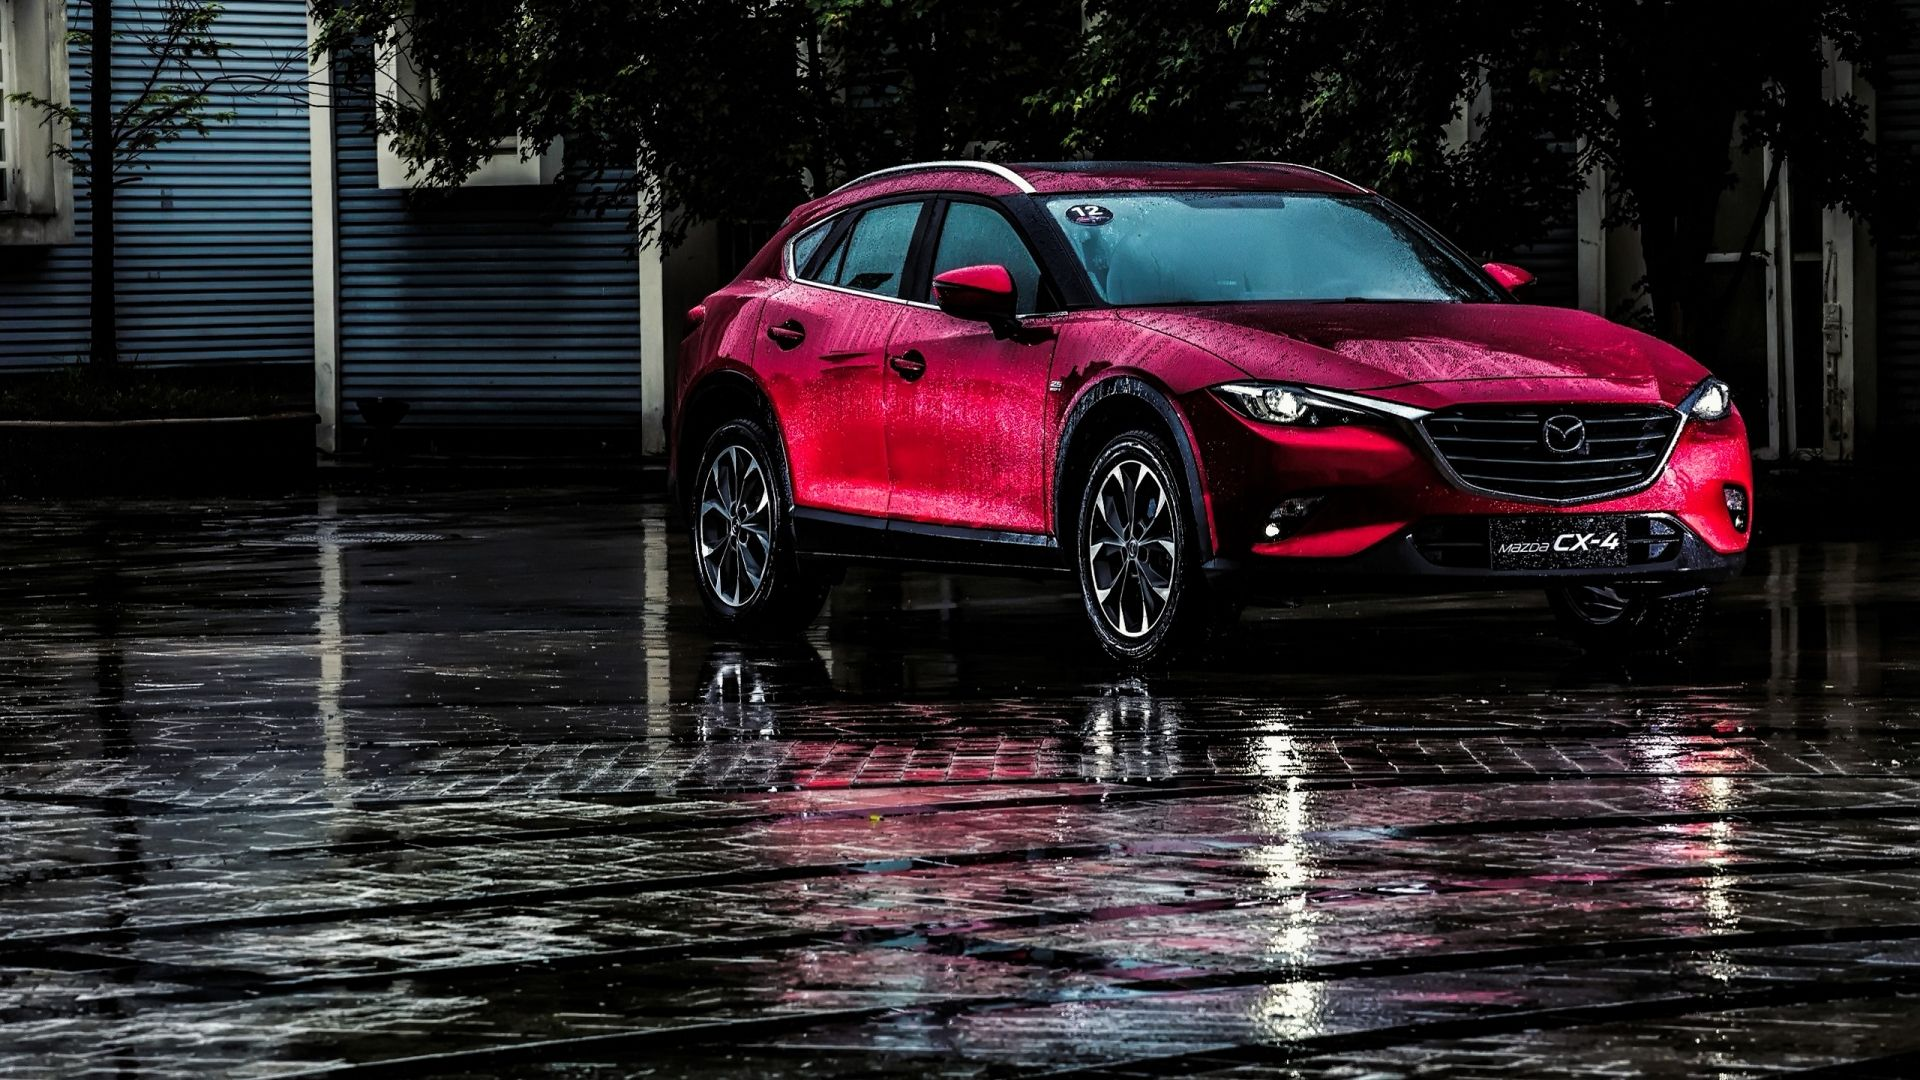 Mazda hd wallpaper 1080